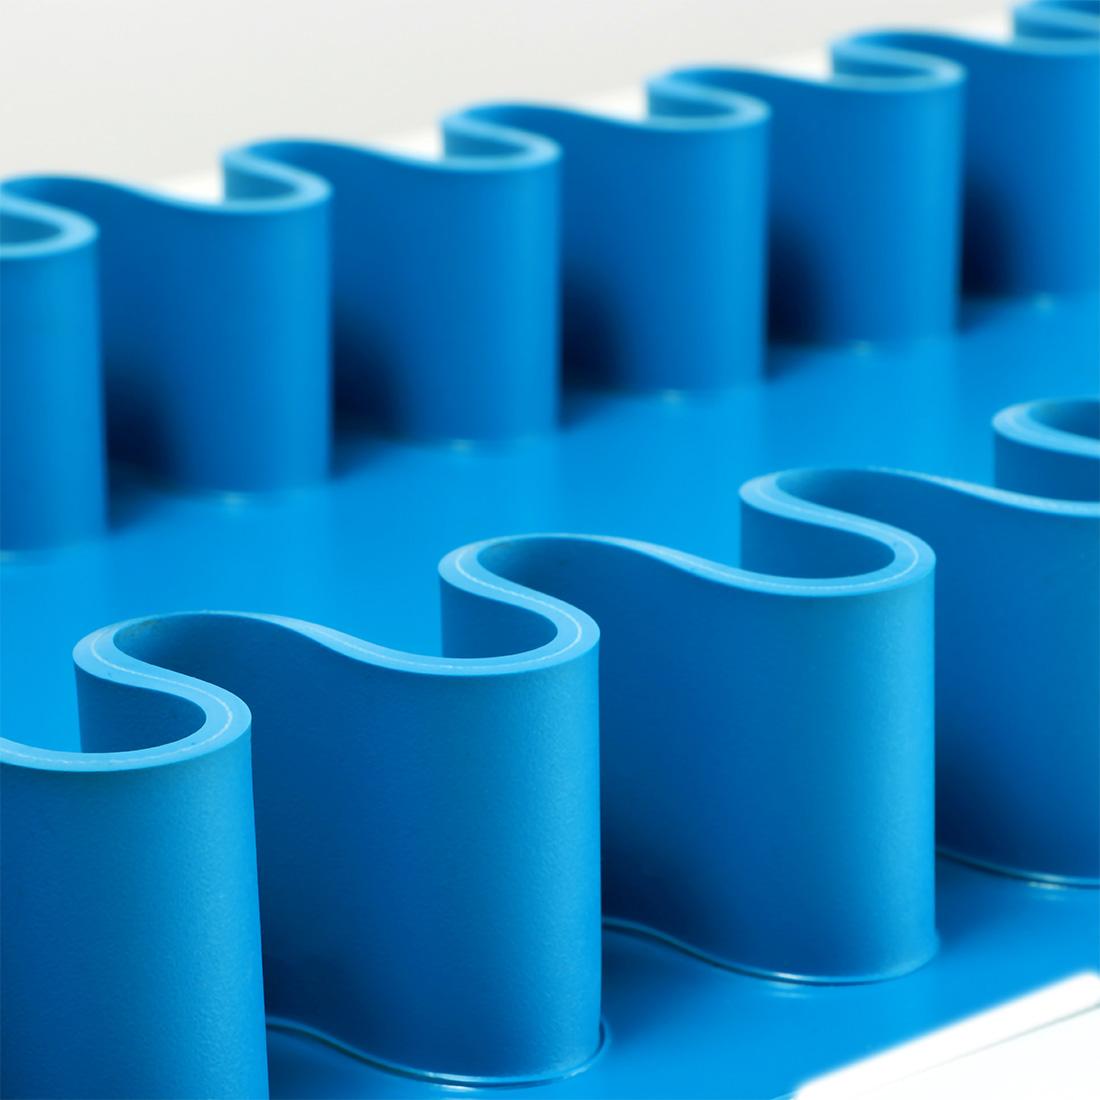 gewebeverstärkte Wellkante aus PVC